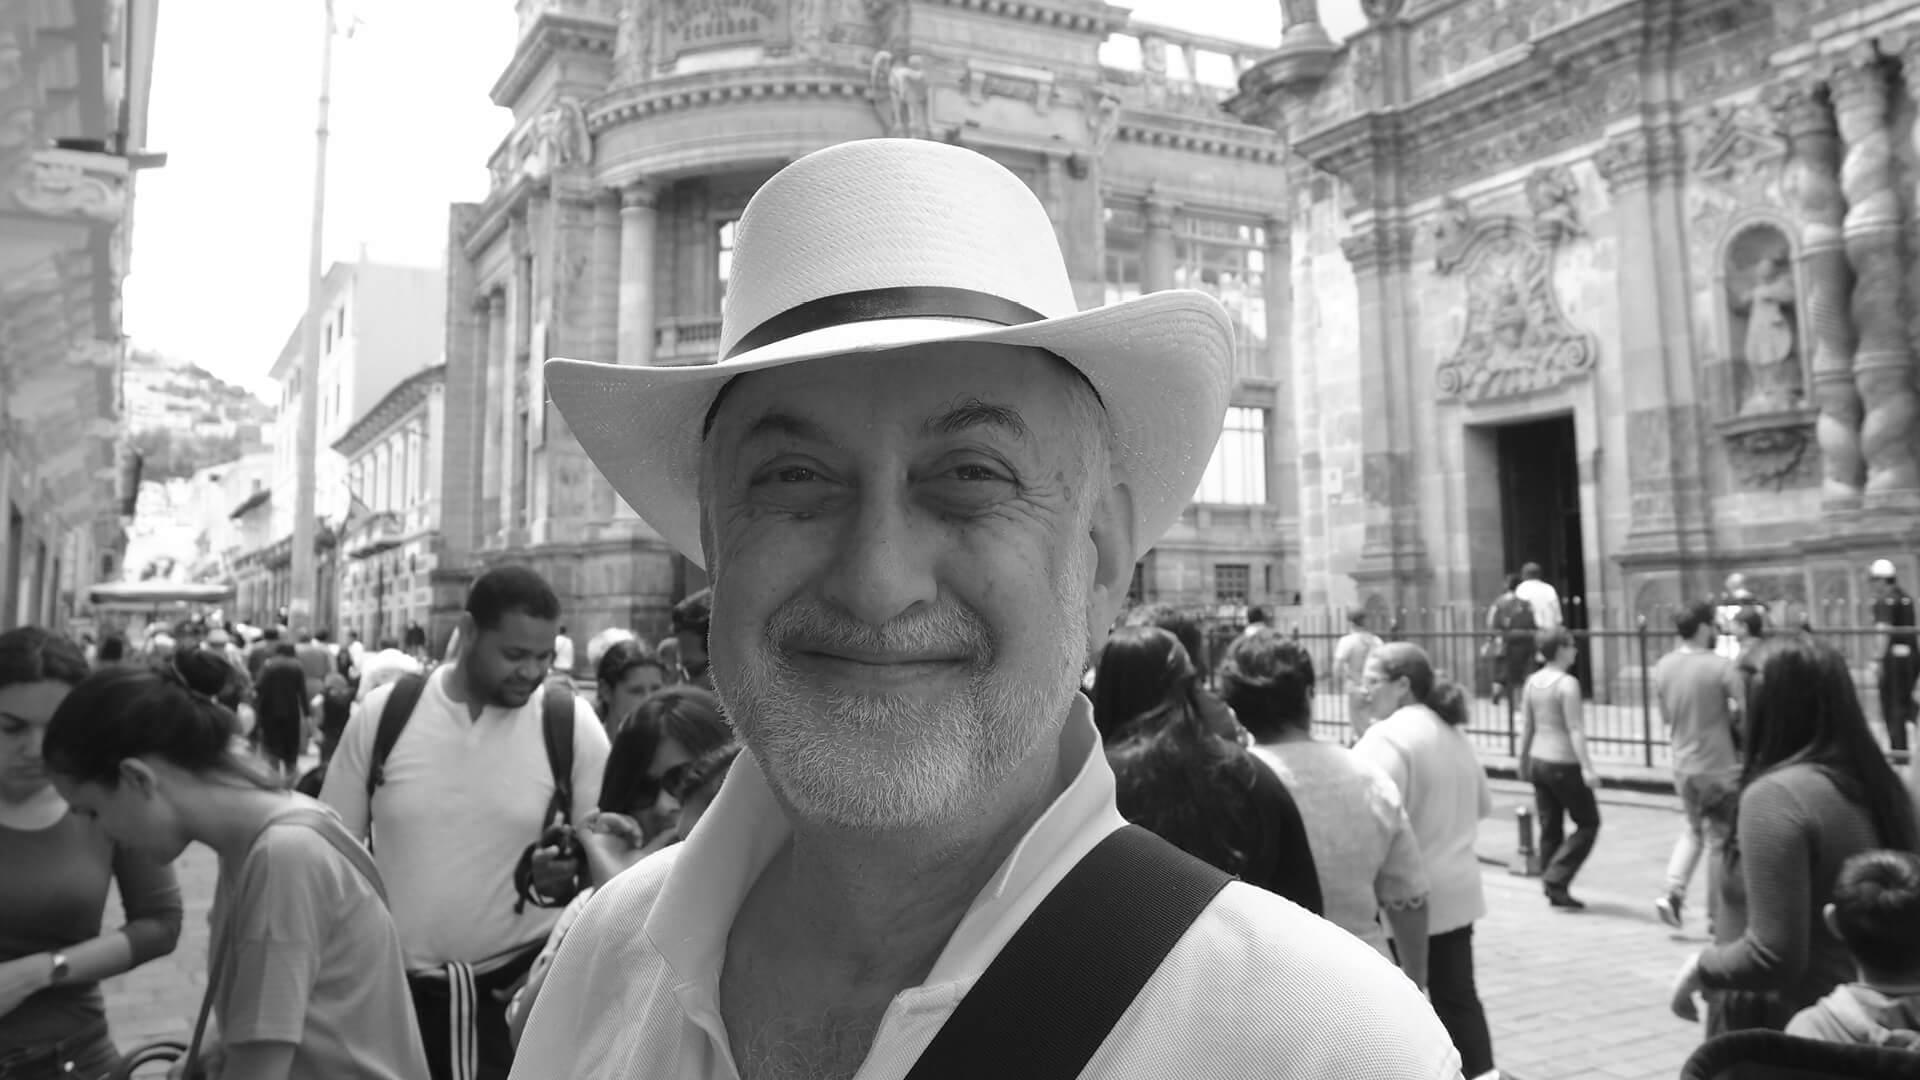 Late architect, urbanist and writer Michael Sorkin | Remembering Michael Sorkin | Laurie Sheck | STIRworld